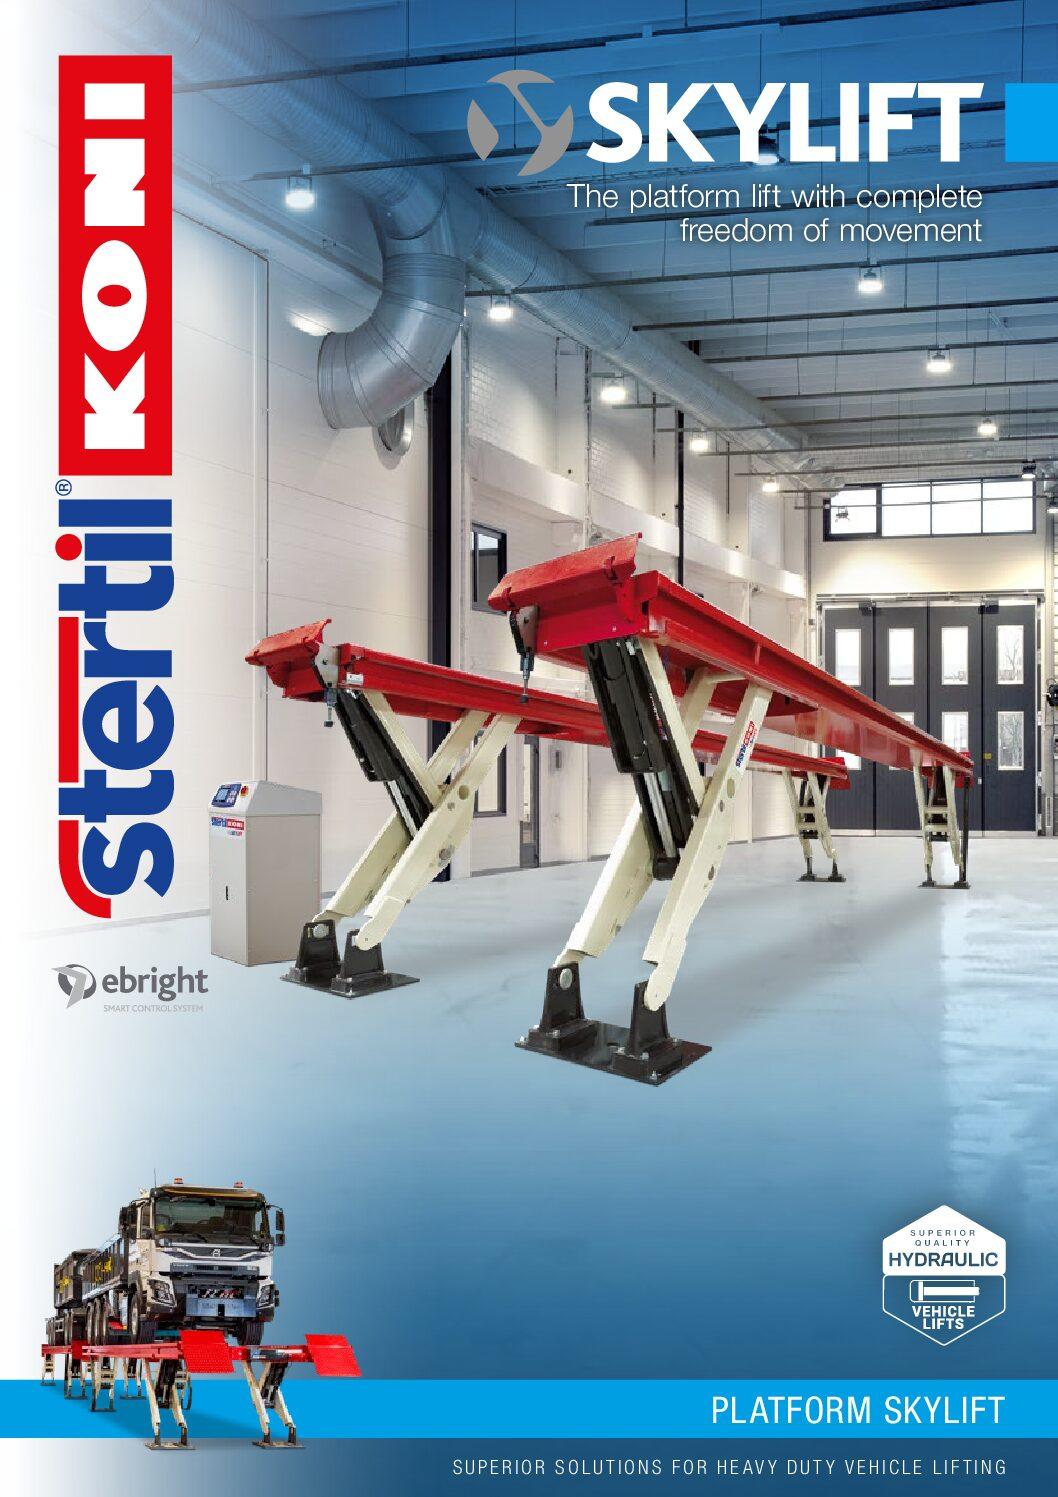 Stertil-Koni: SKYLIFT – GB Version